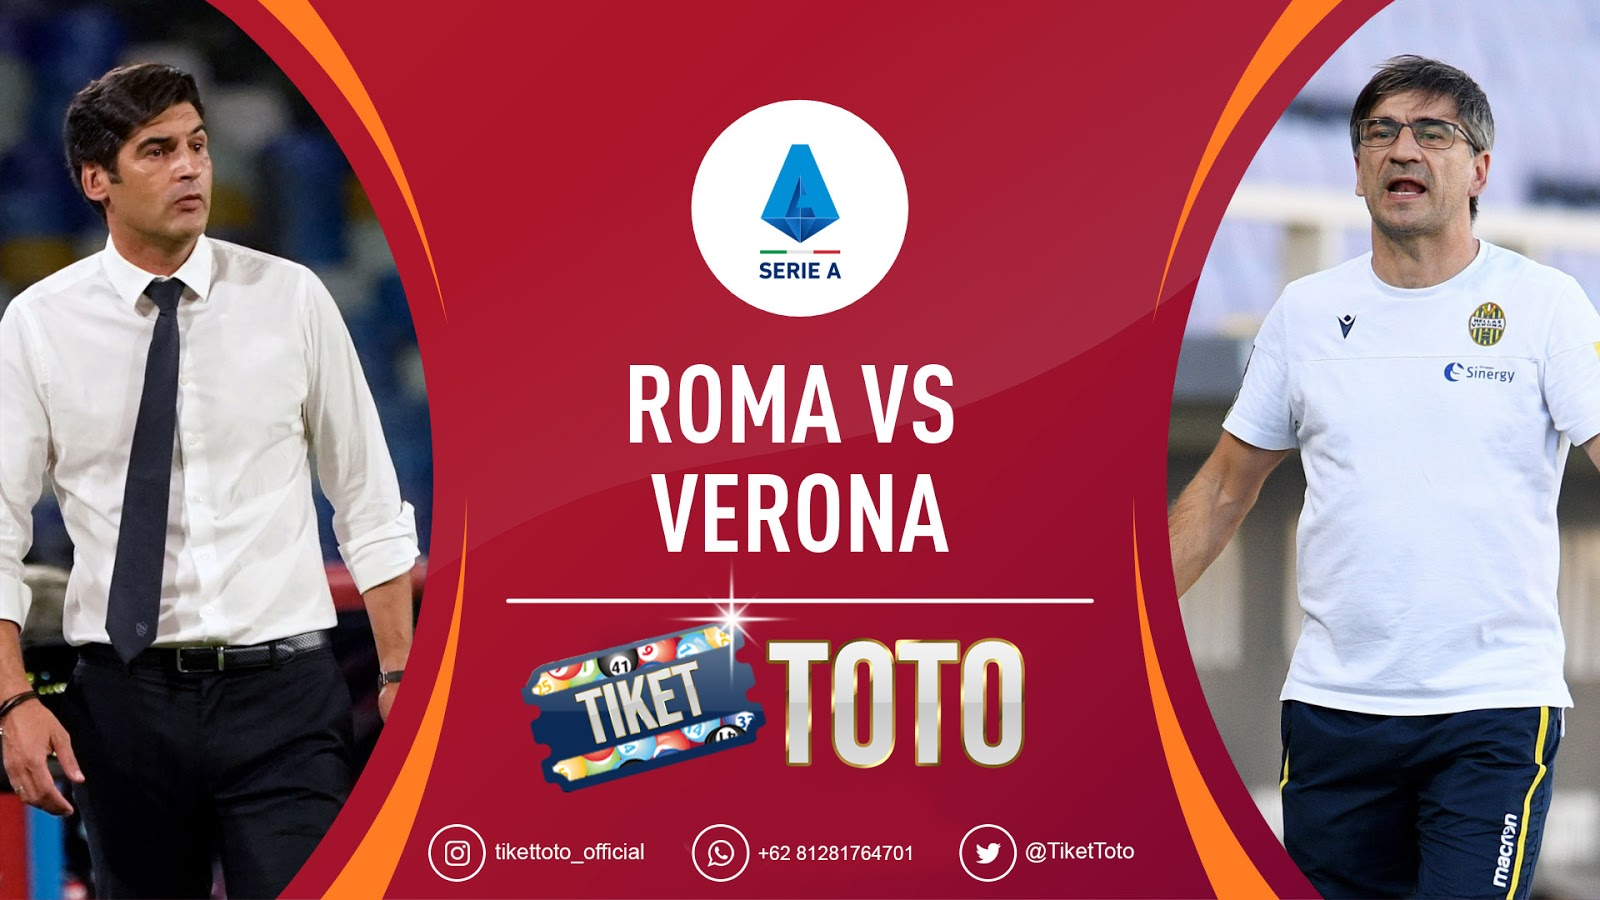 Roma Tumbangkan Verona, Lazio Imbang dengan Udinese